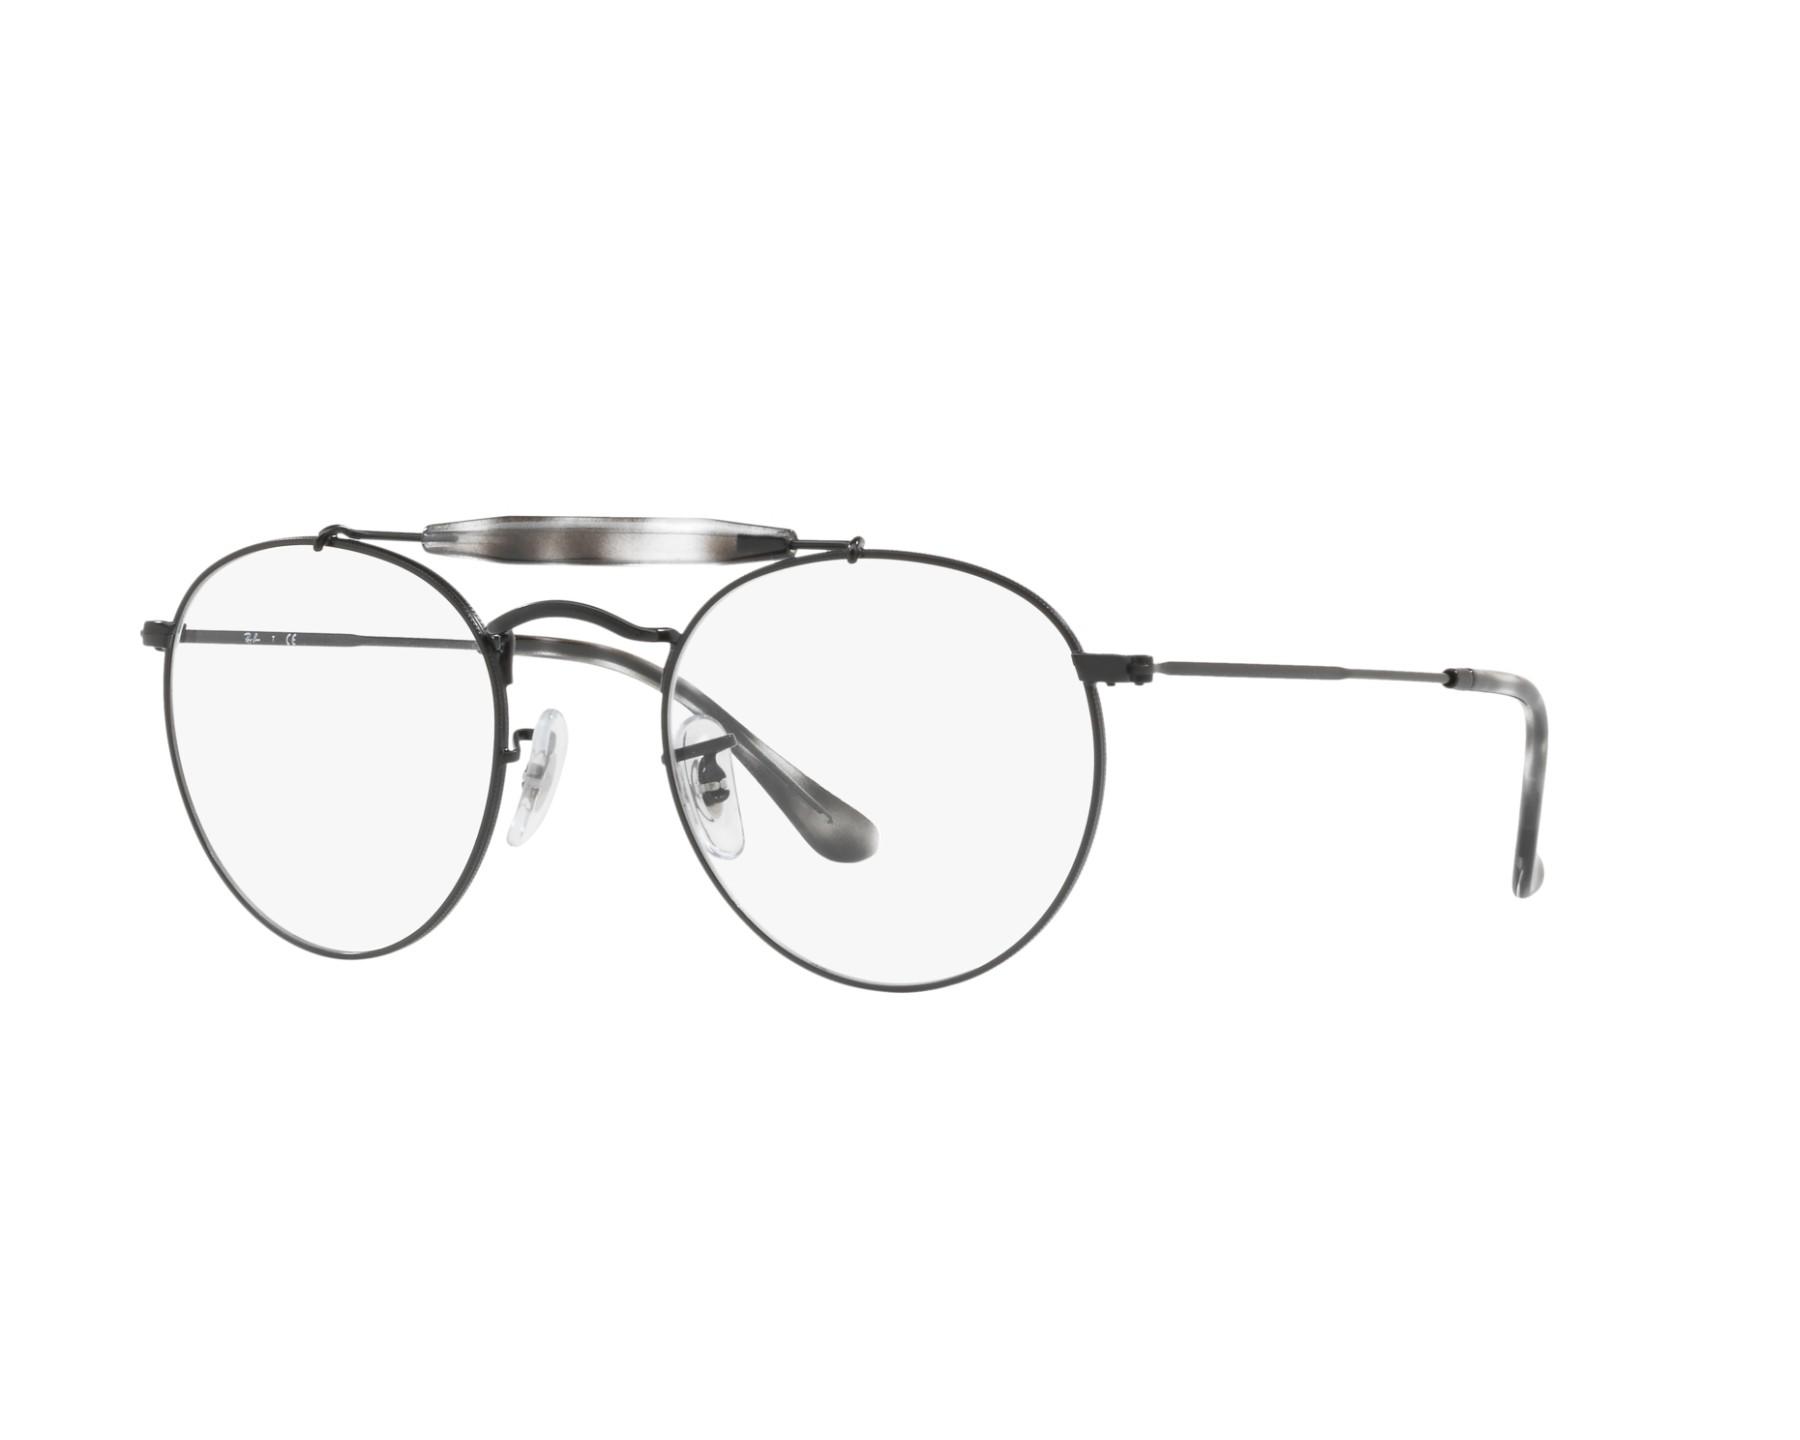 361d1dcd94 eyeglasses Ray-Ban RX-3747-V 2760 47-21 Black Grey